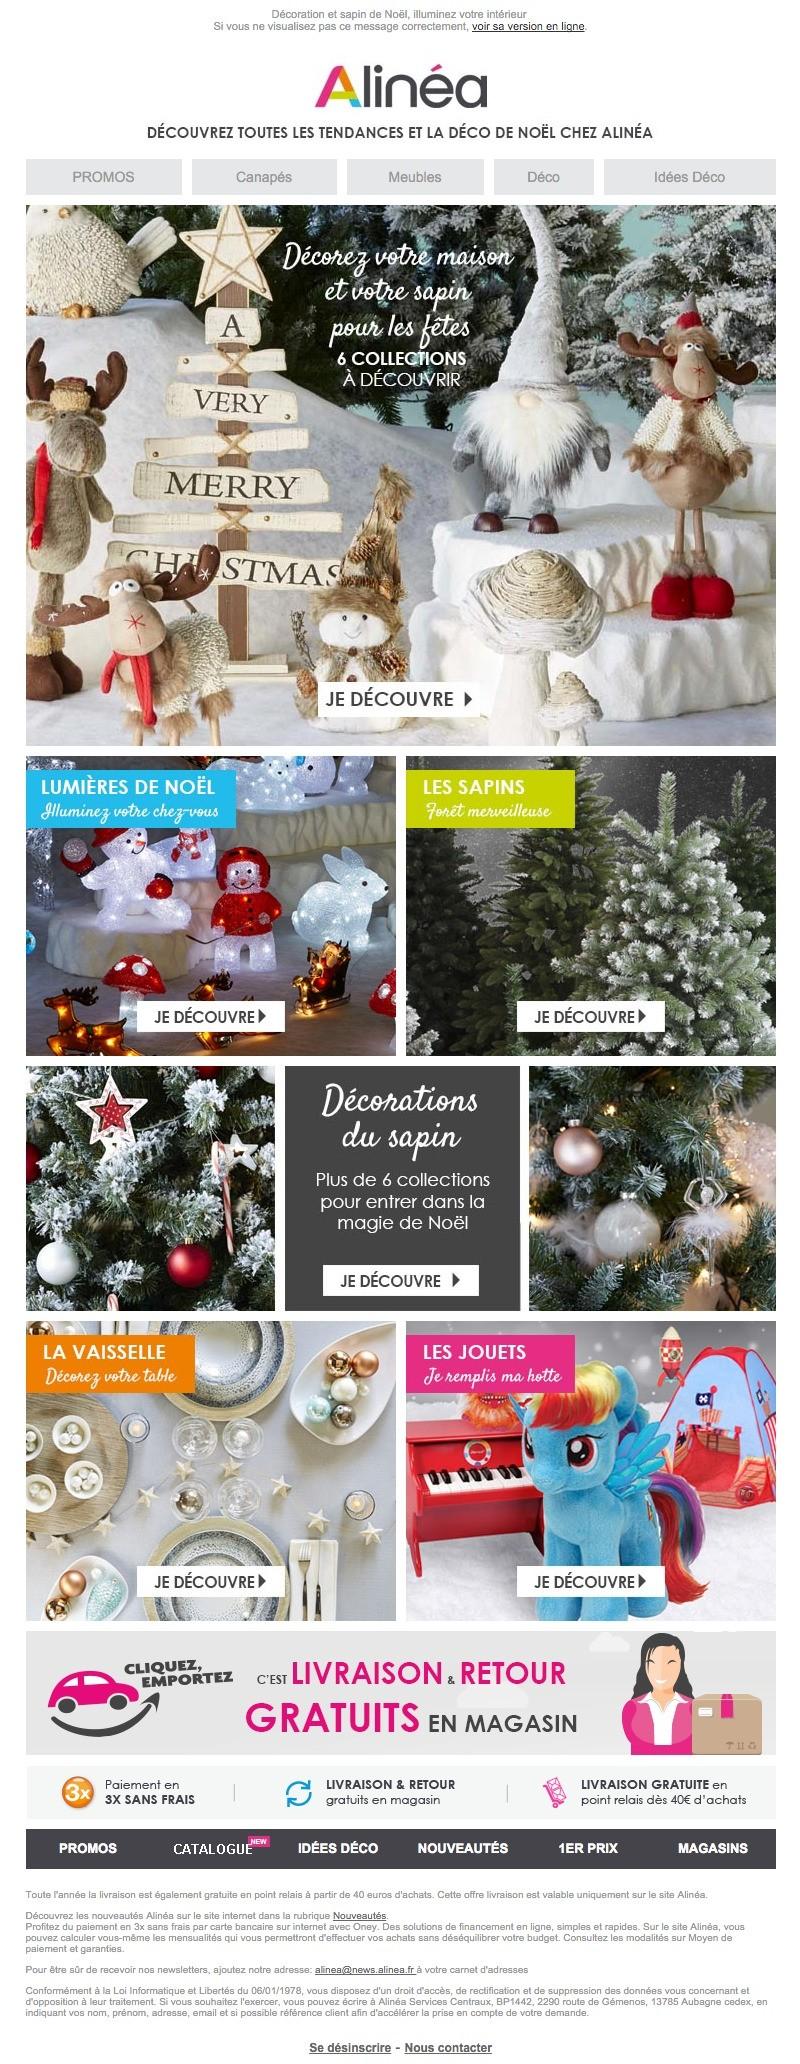 Newsletter Alinéa du 8 novembre 2015